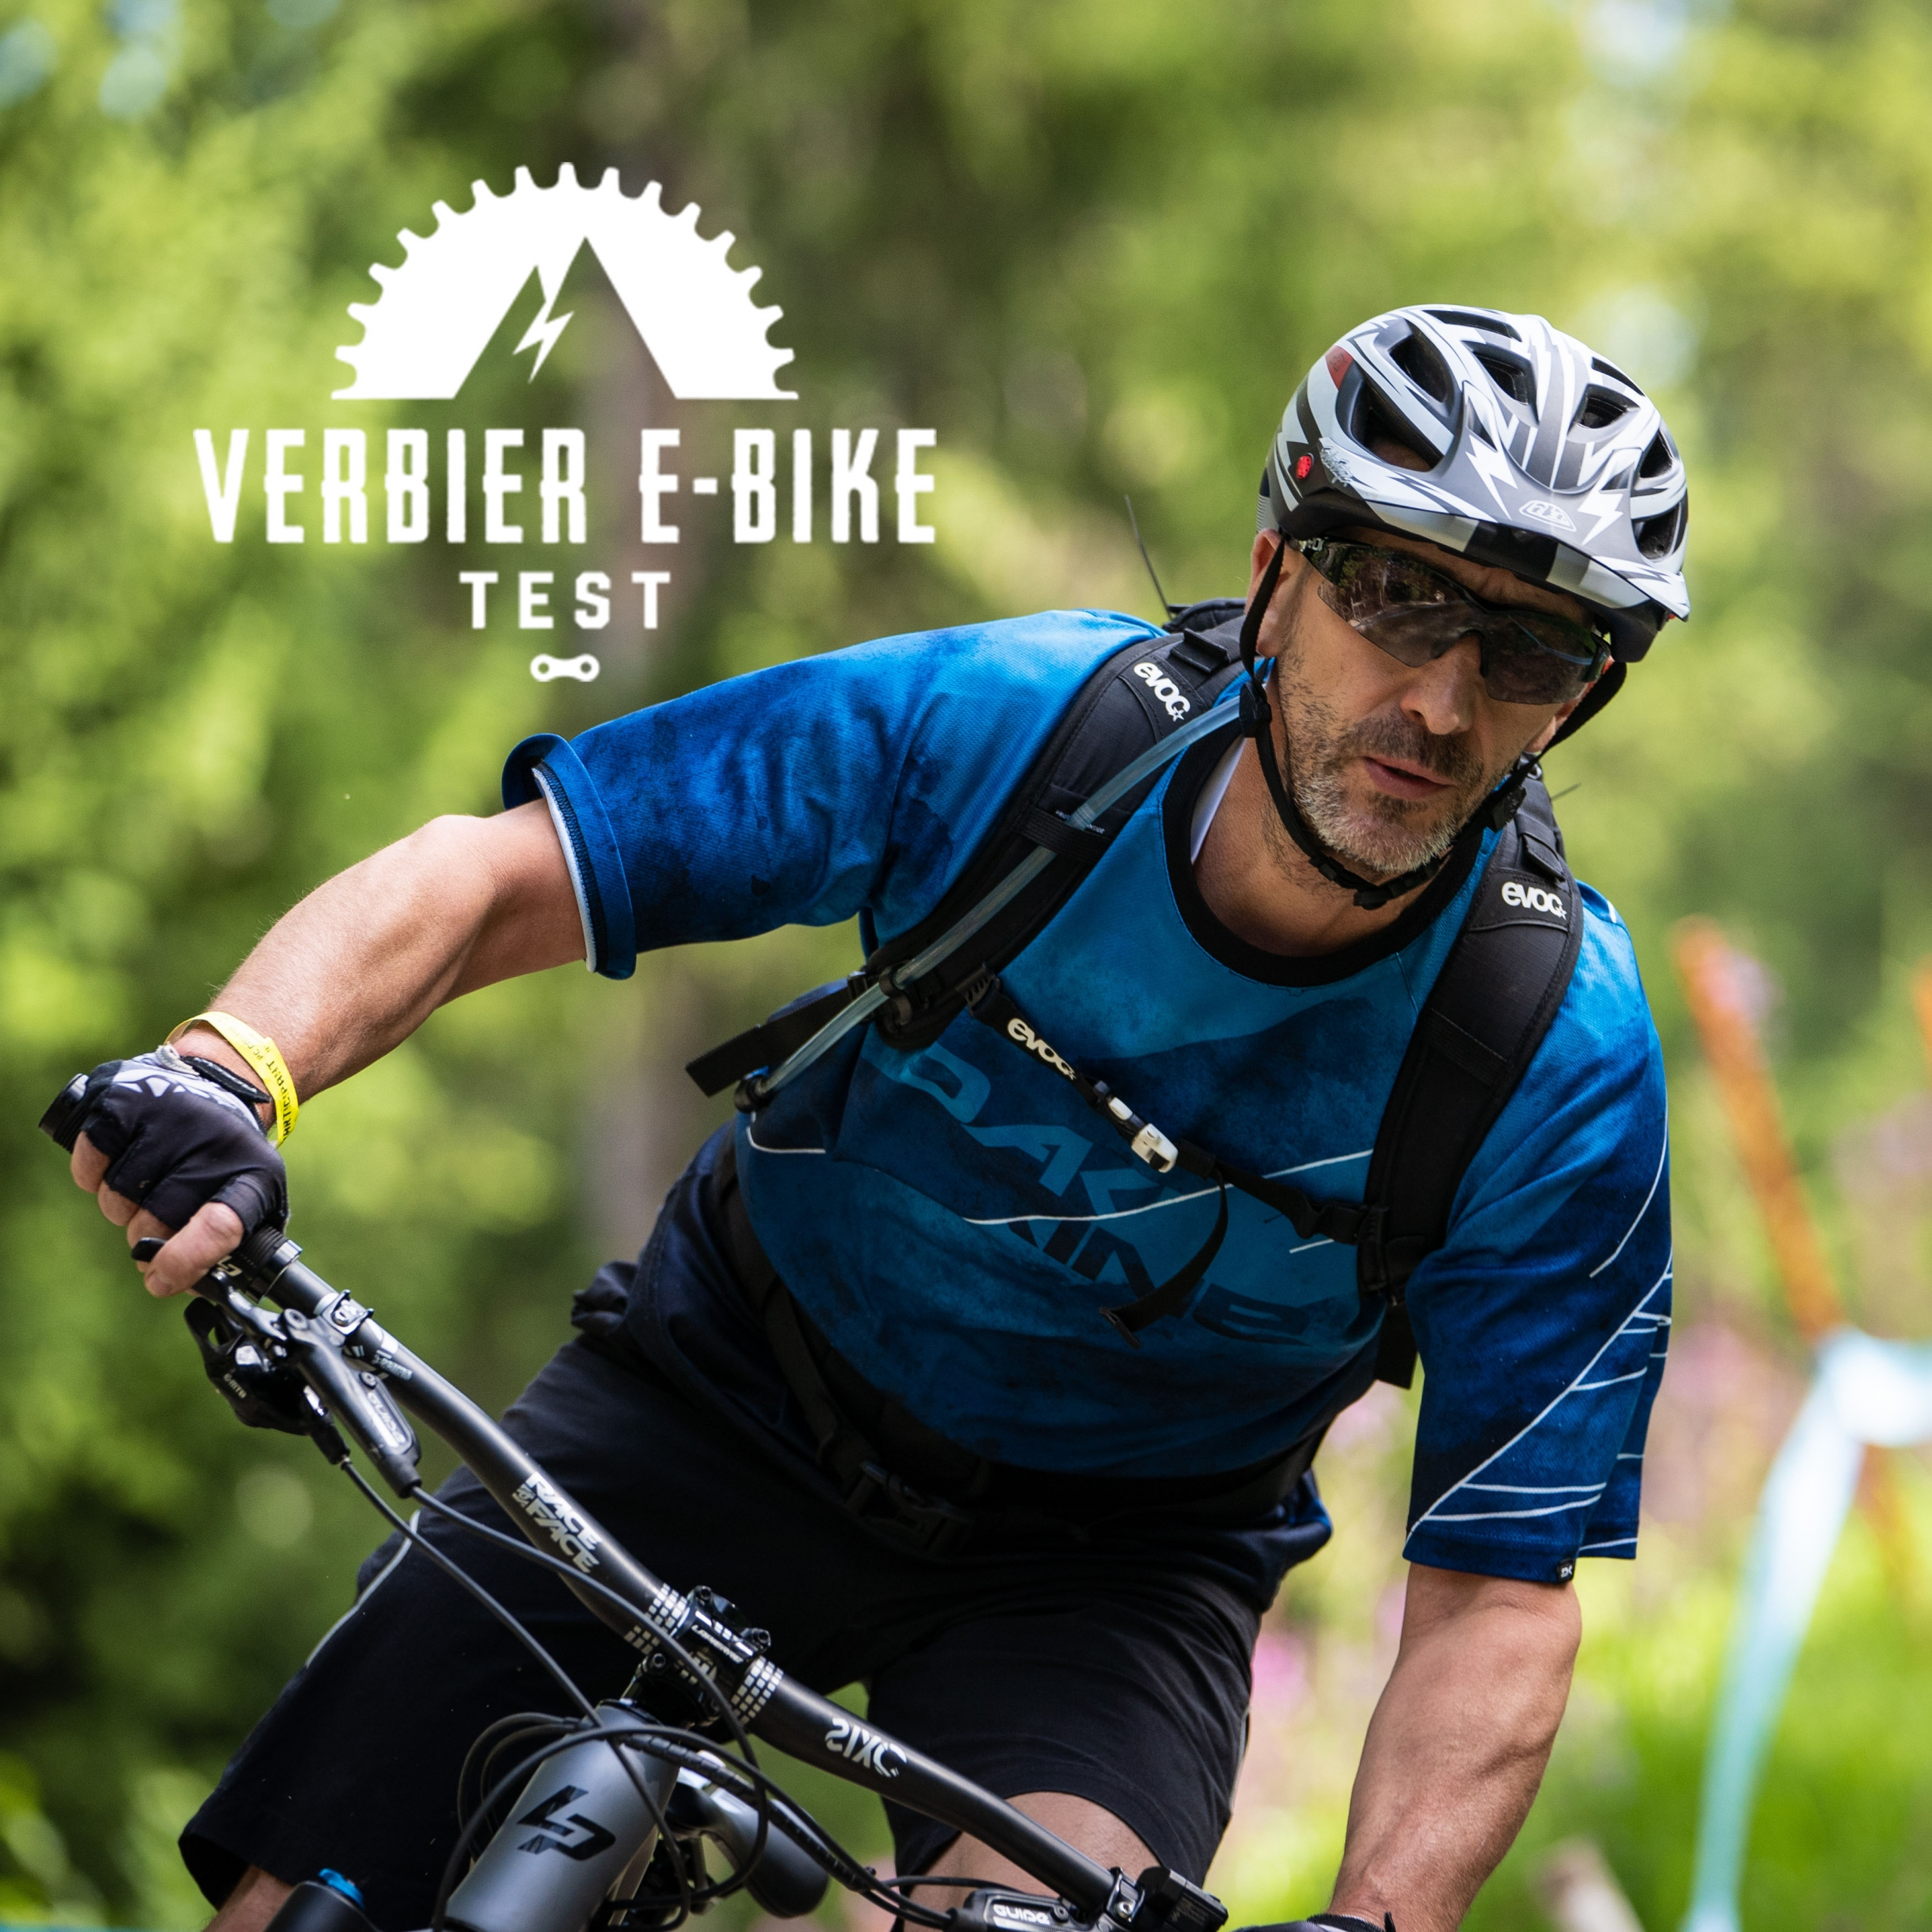 Verbier eBike Festival 2019 - Samedi